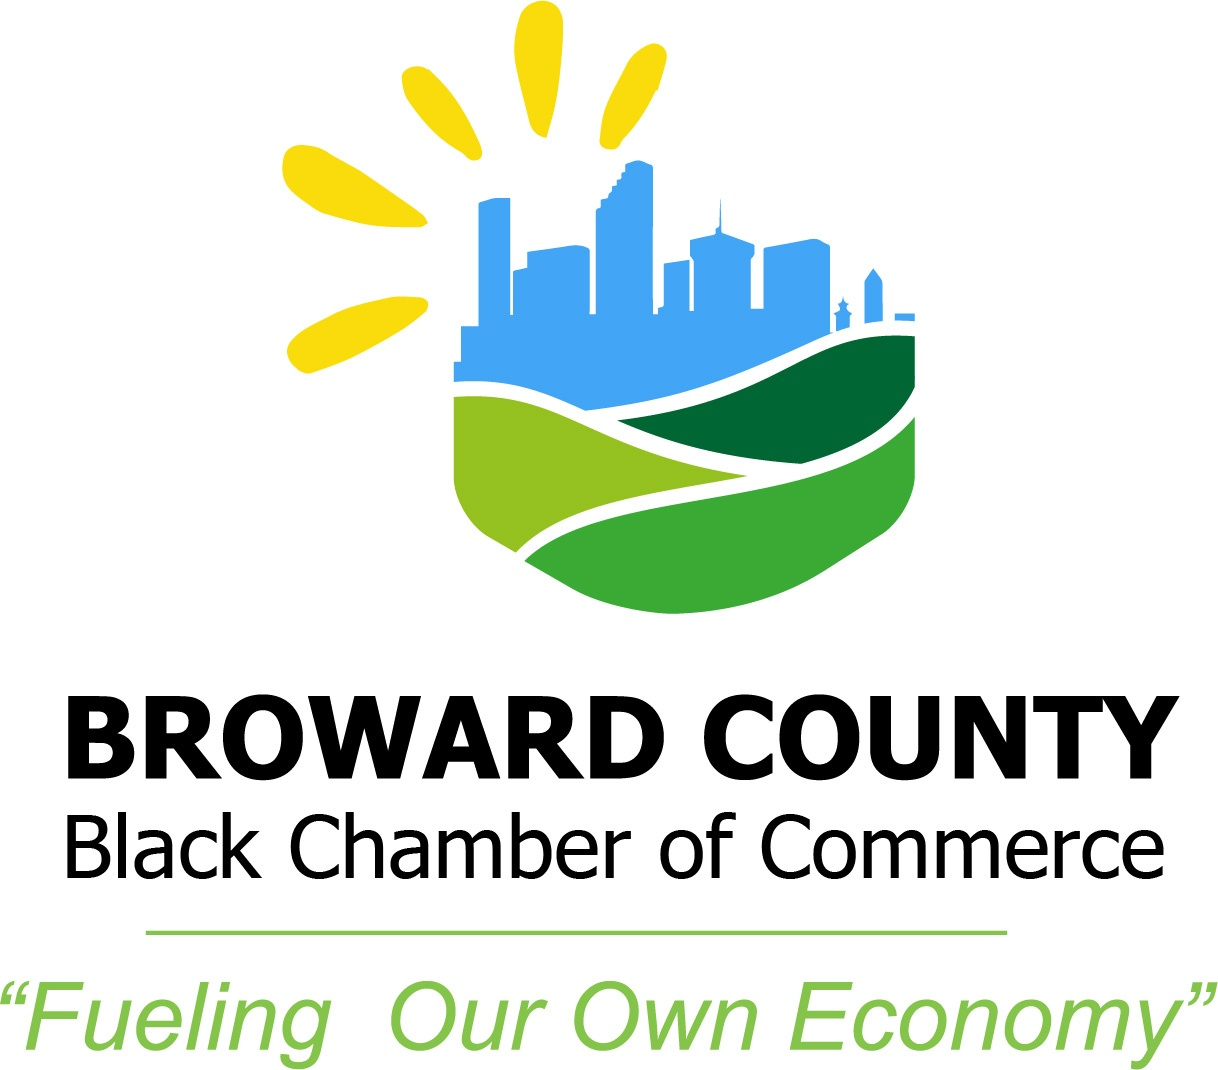 Broward County Black Chamber of Commerce